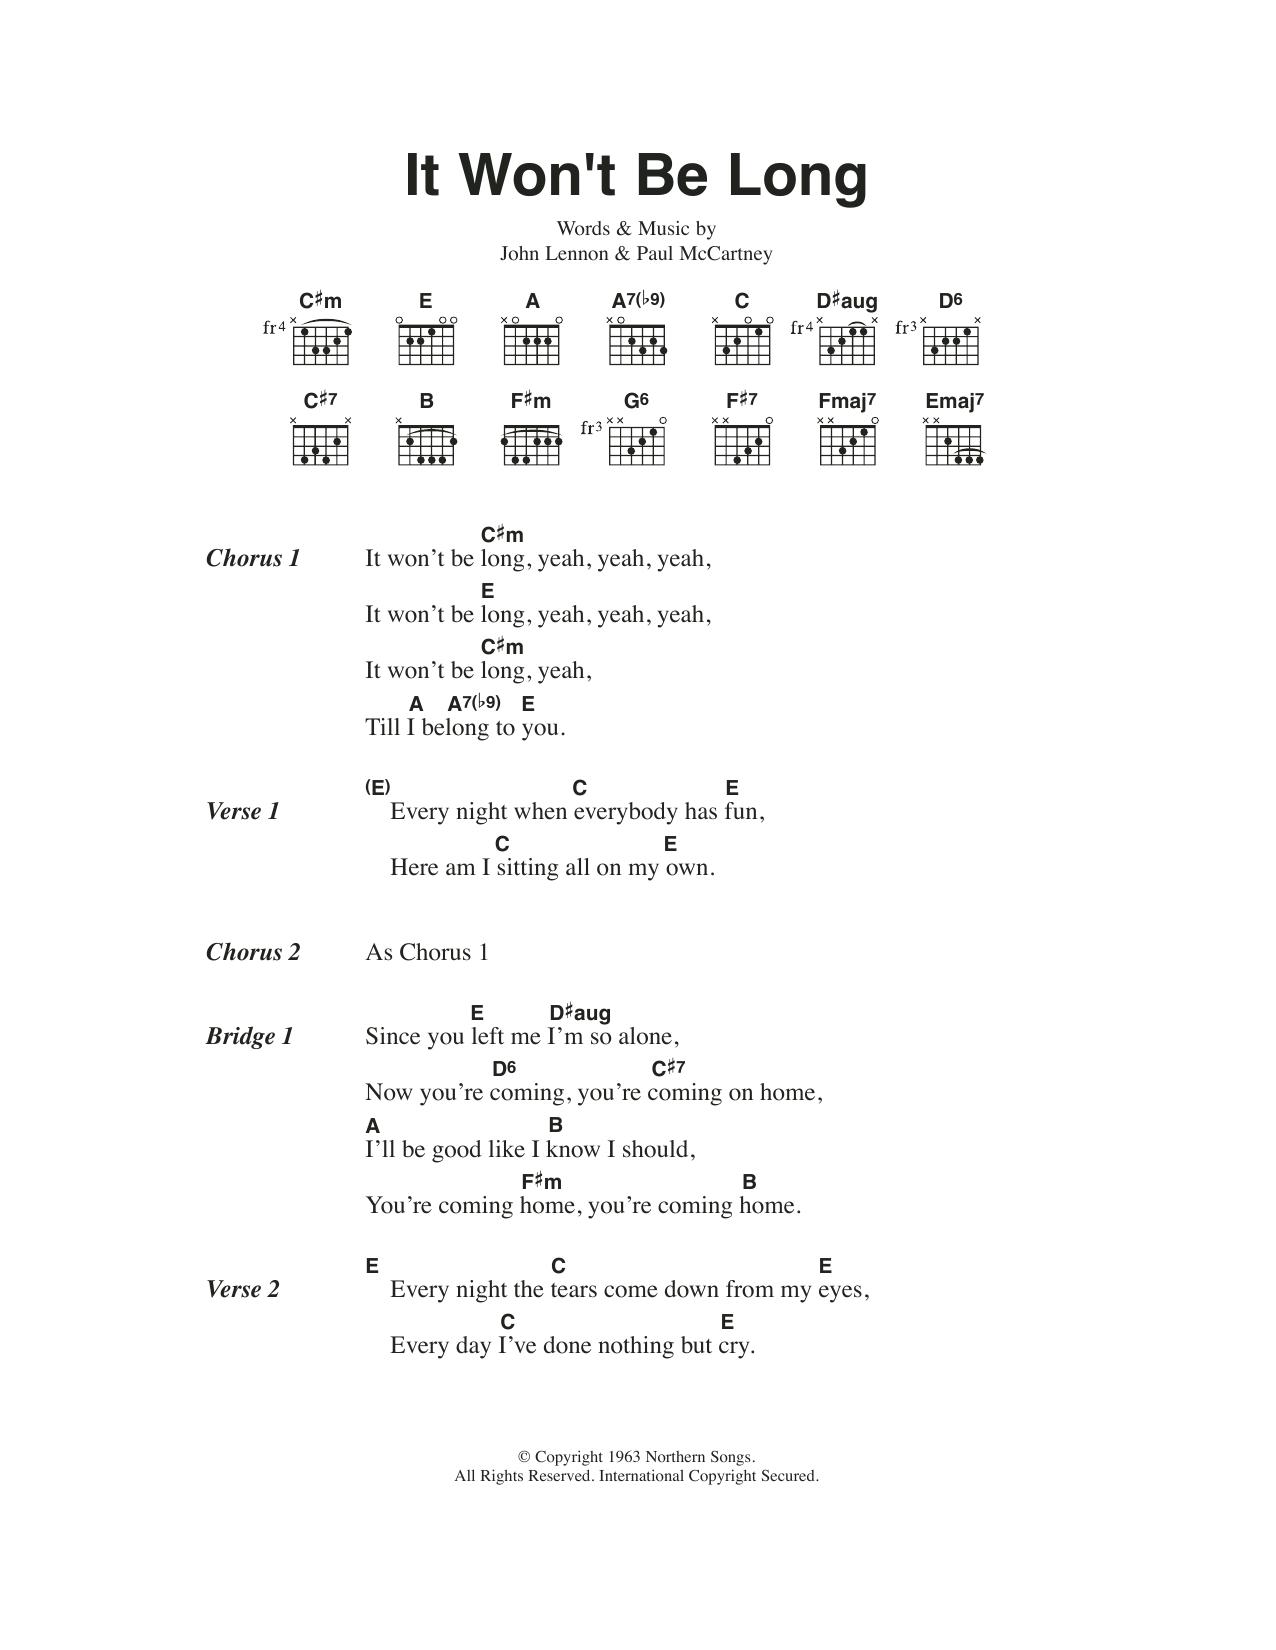 It Wont Be Long By The Beatles Guitar Chordslyrics Guitar